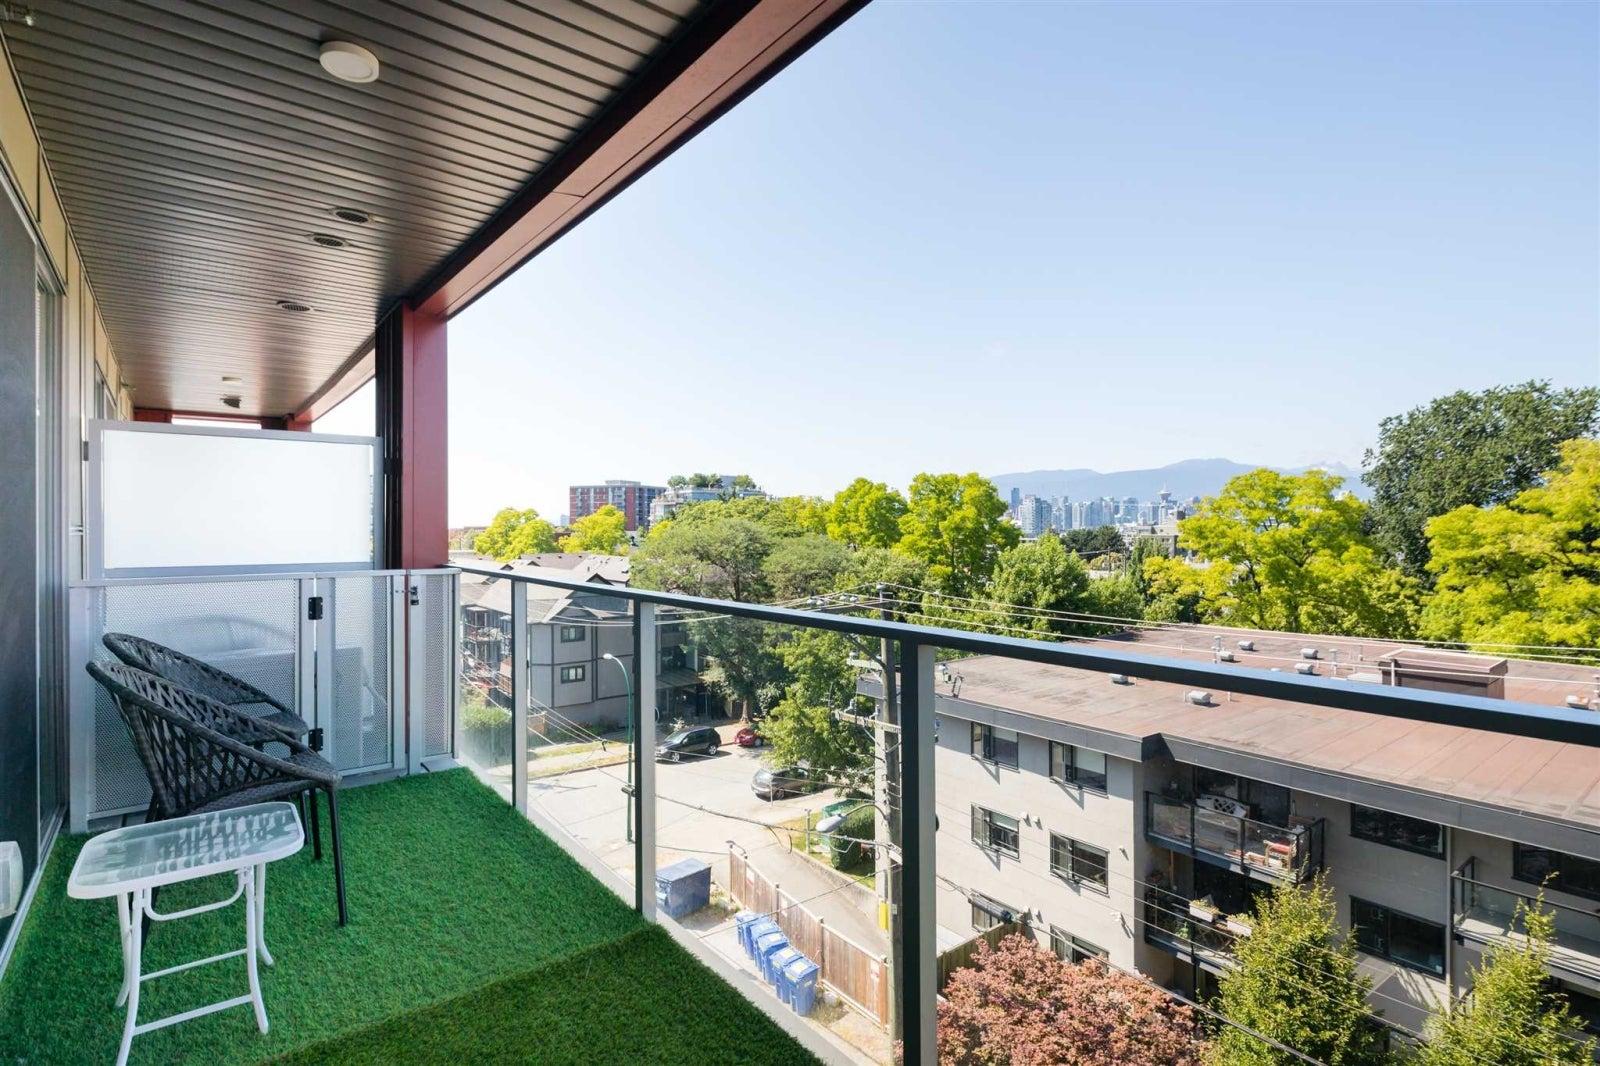 408 379 E BROADWAY AVENUE - Mount Pleasant VE Apartment/Condo for sale, 2 Bedrooms (R2599900) #20